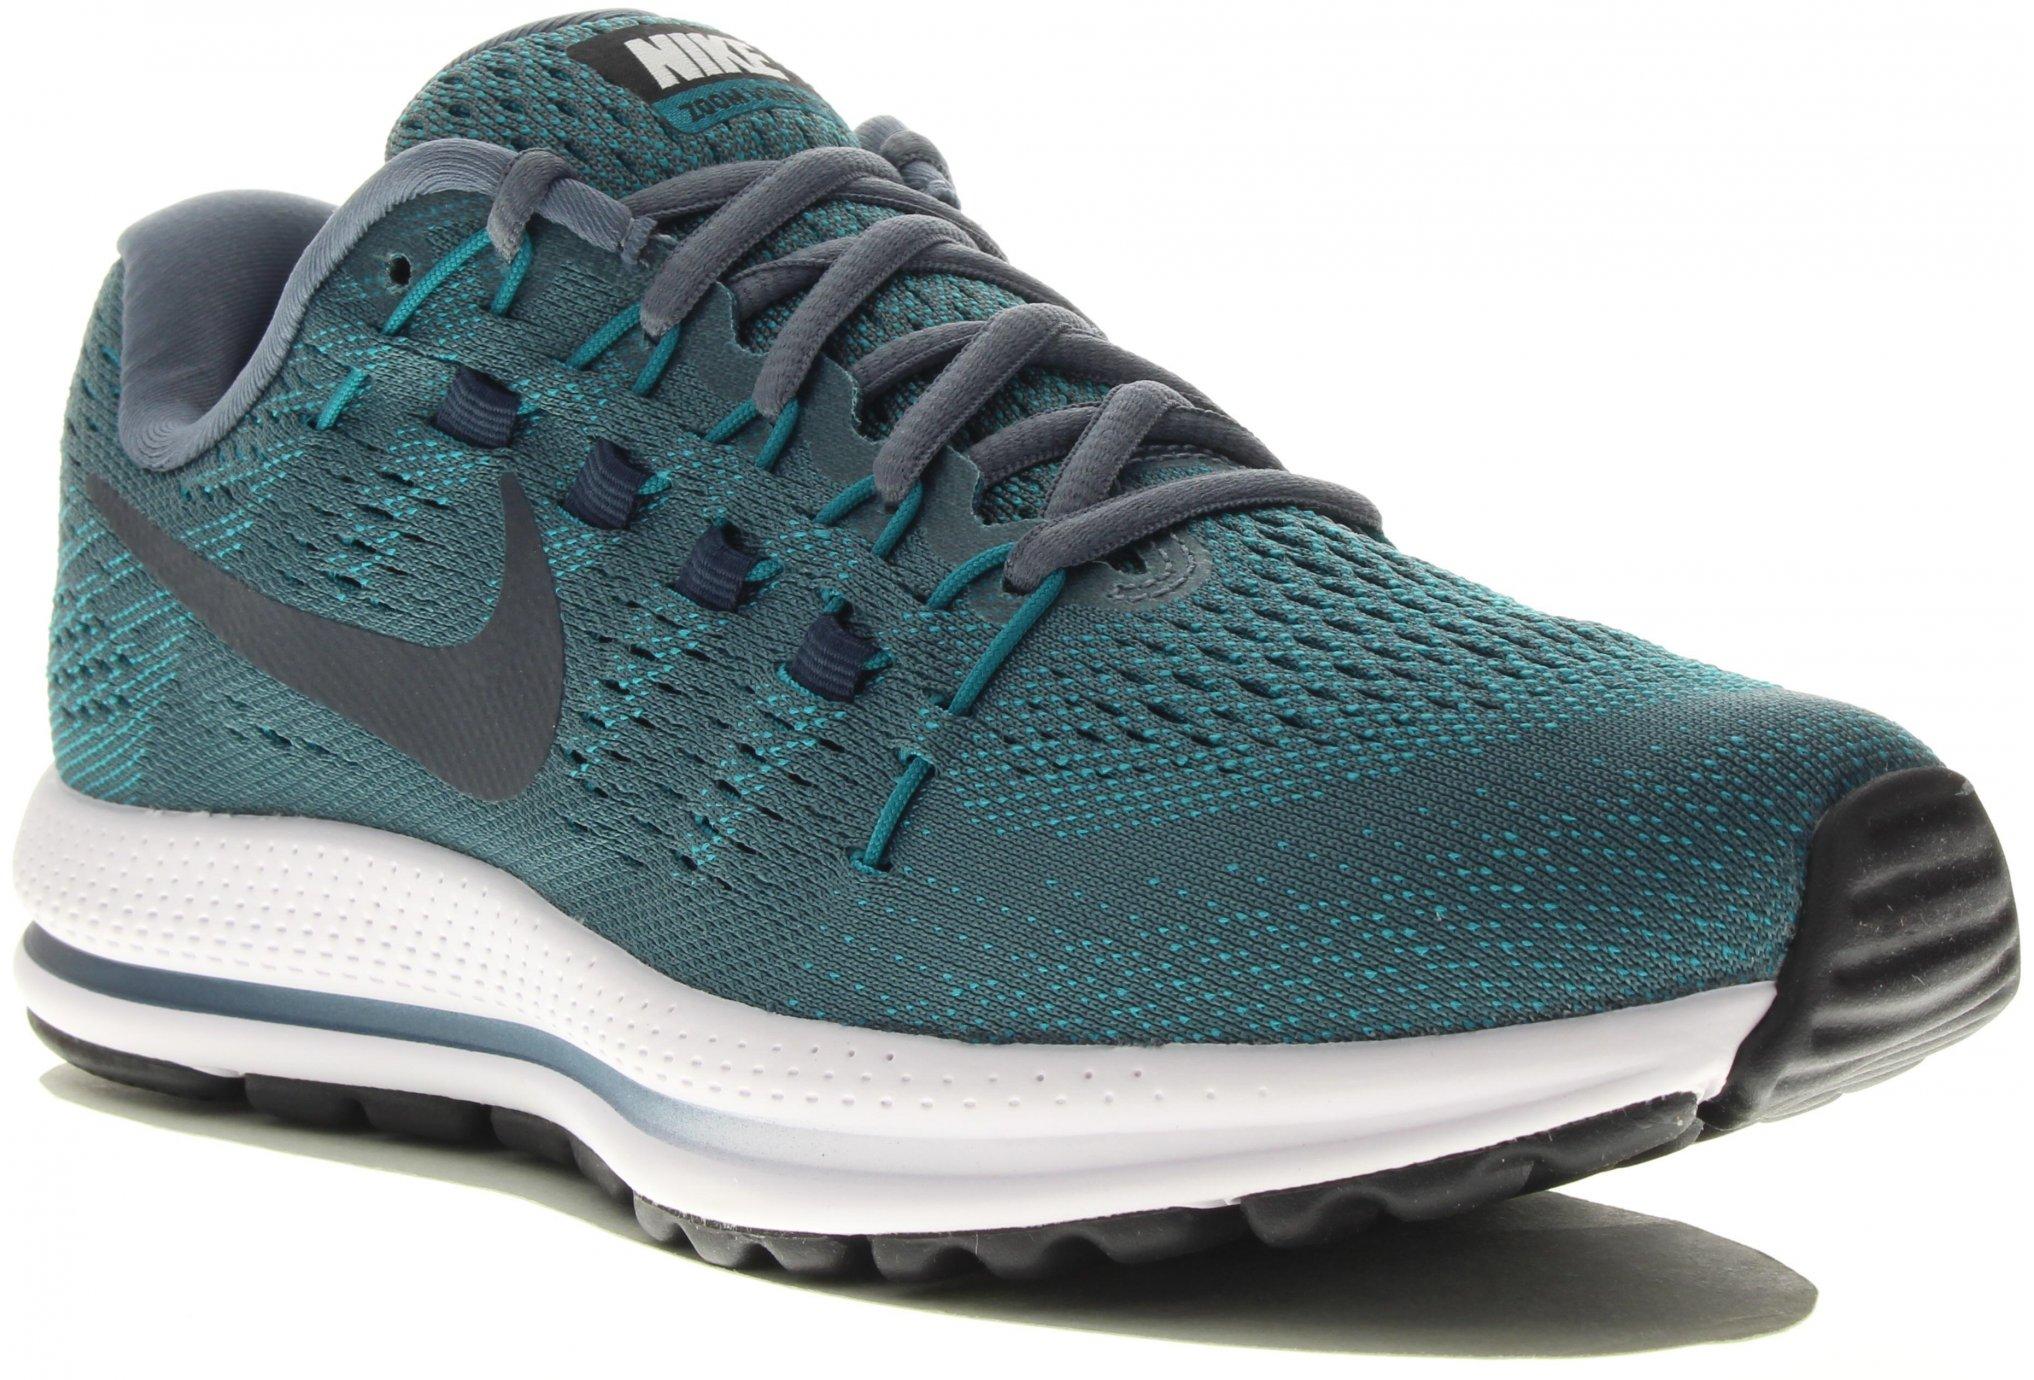 Nike Air Zoom Vomero 12 W Chaussures running femme